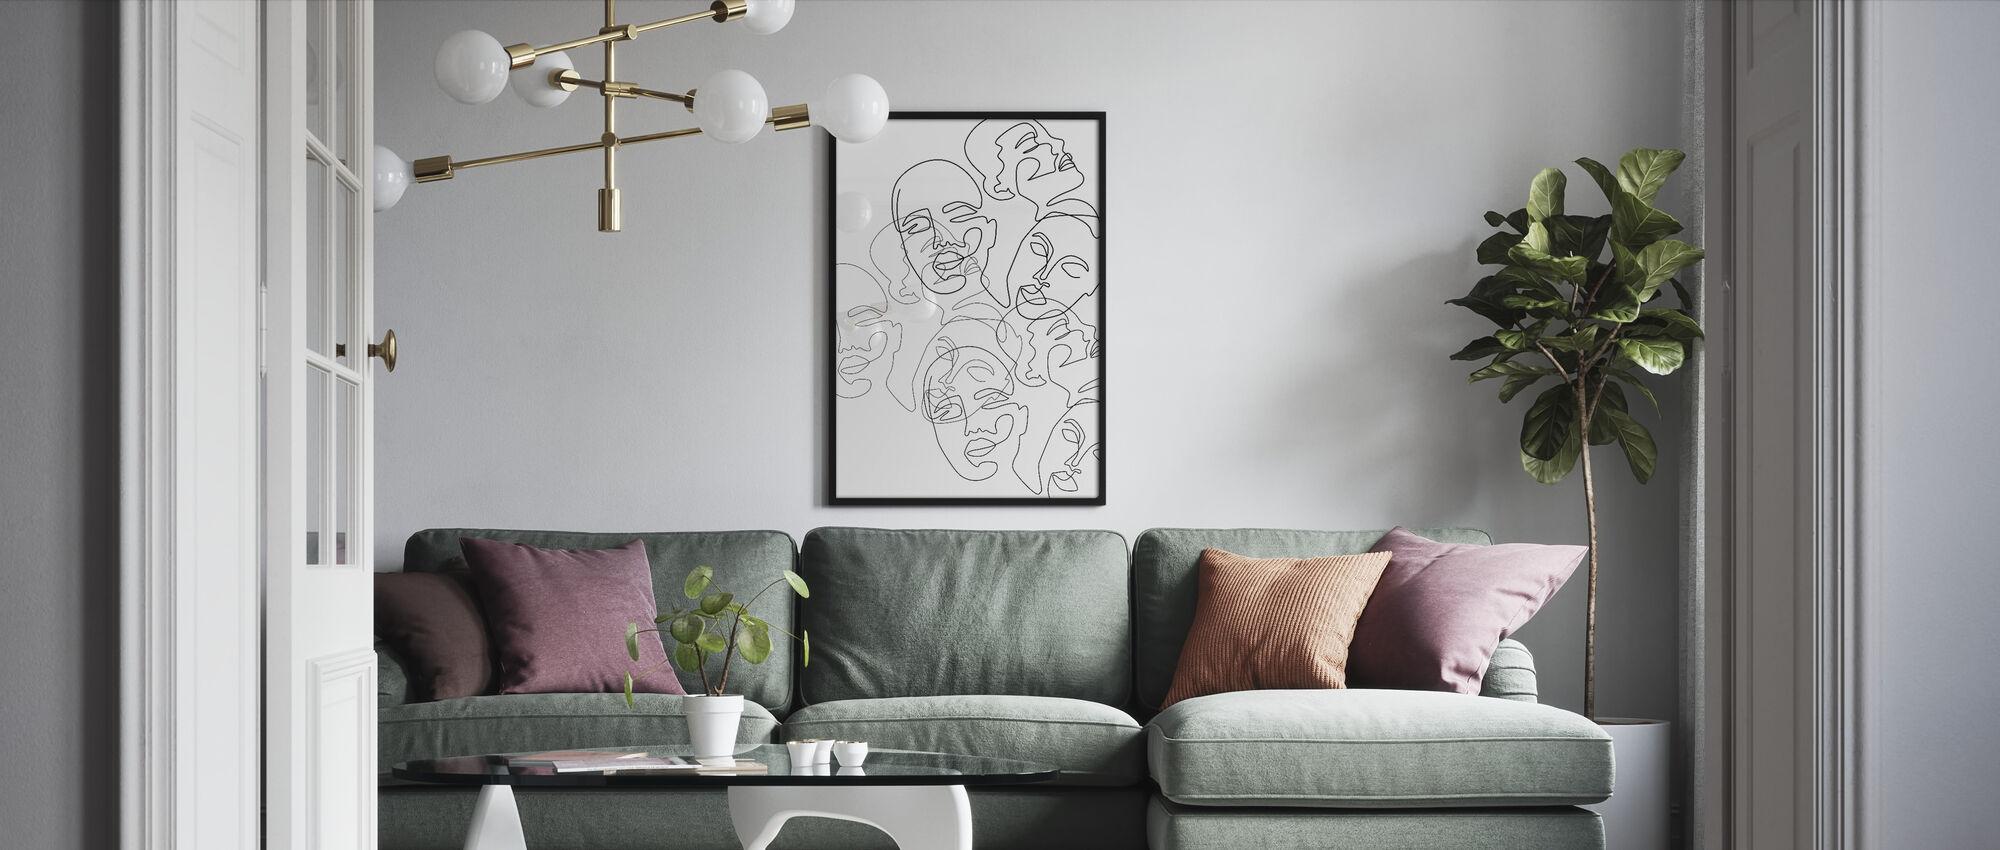 Lined Face Sketches - Framed print - Living Room